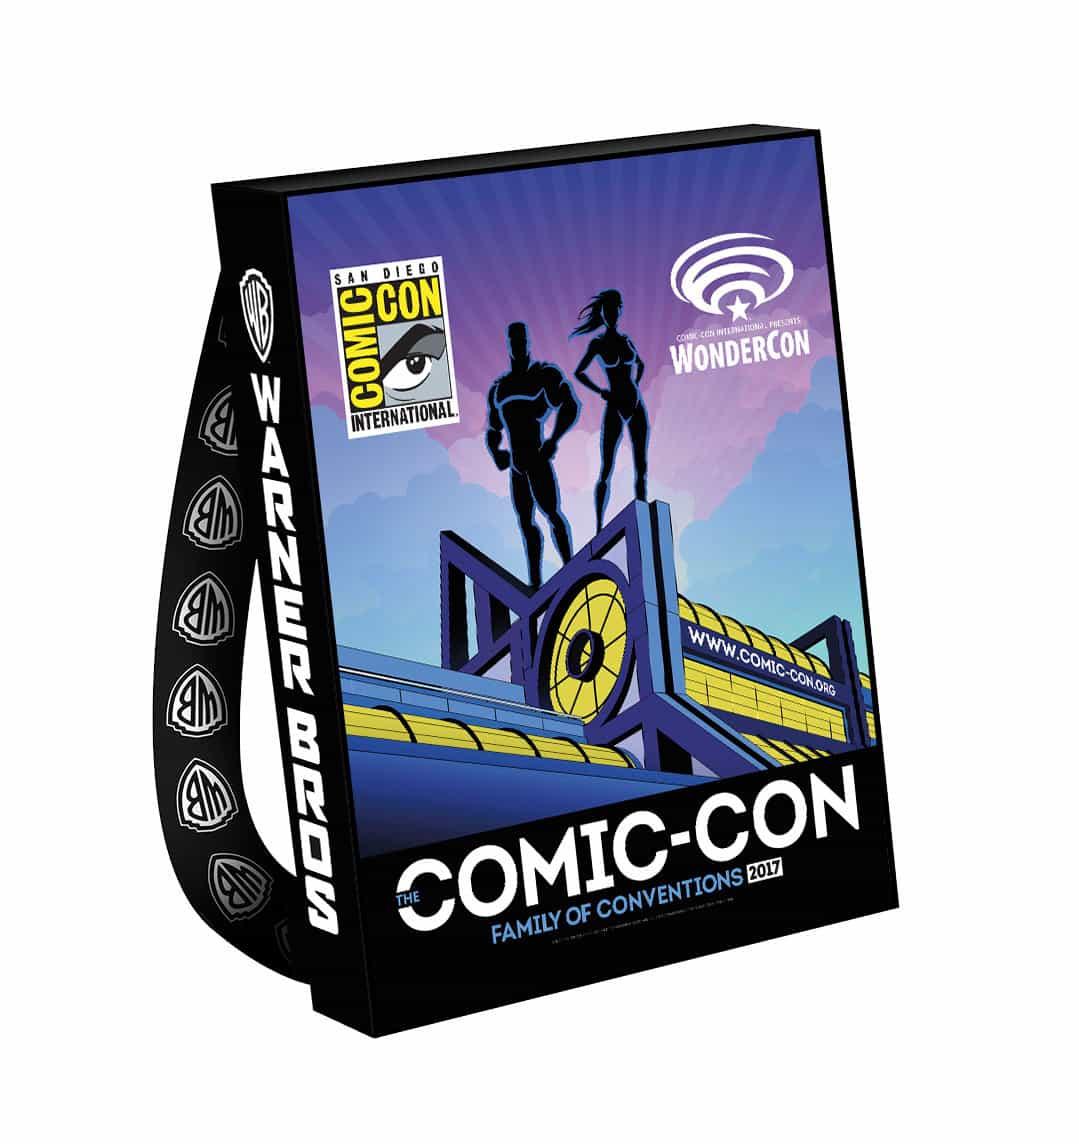 SDCC17 Bag Comic Con International